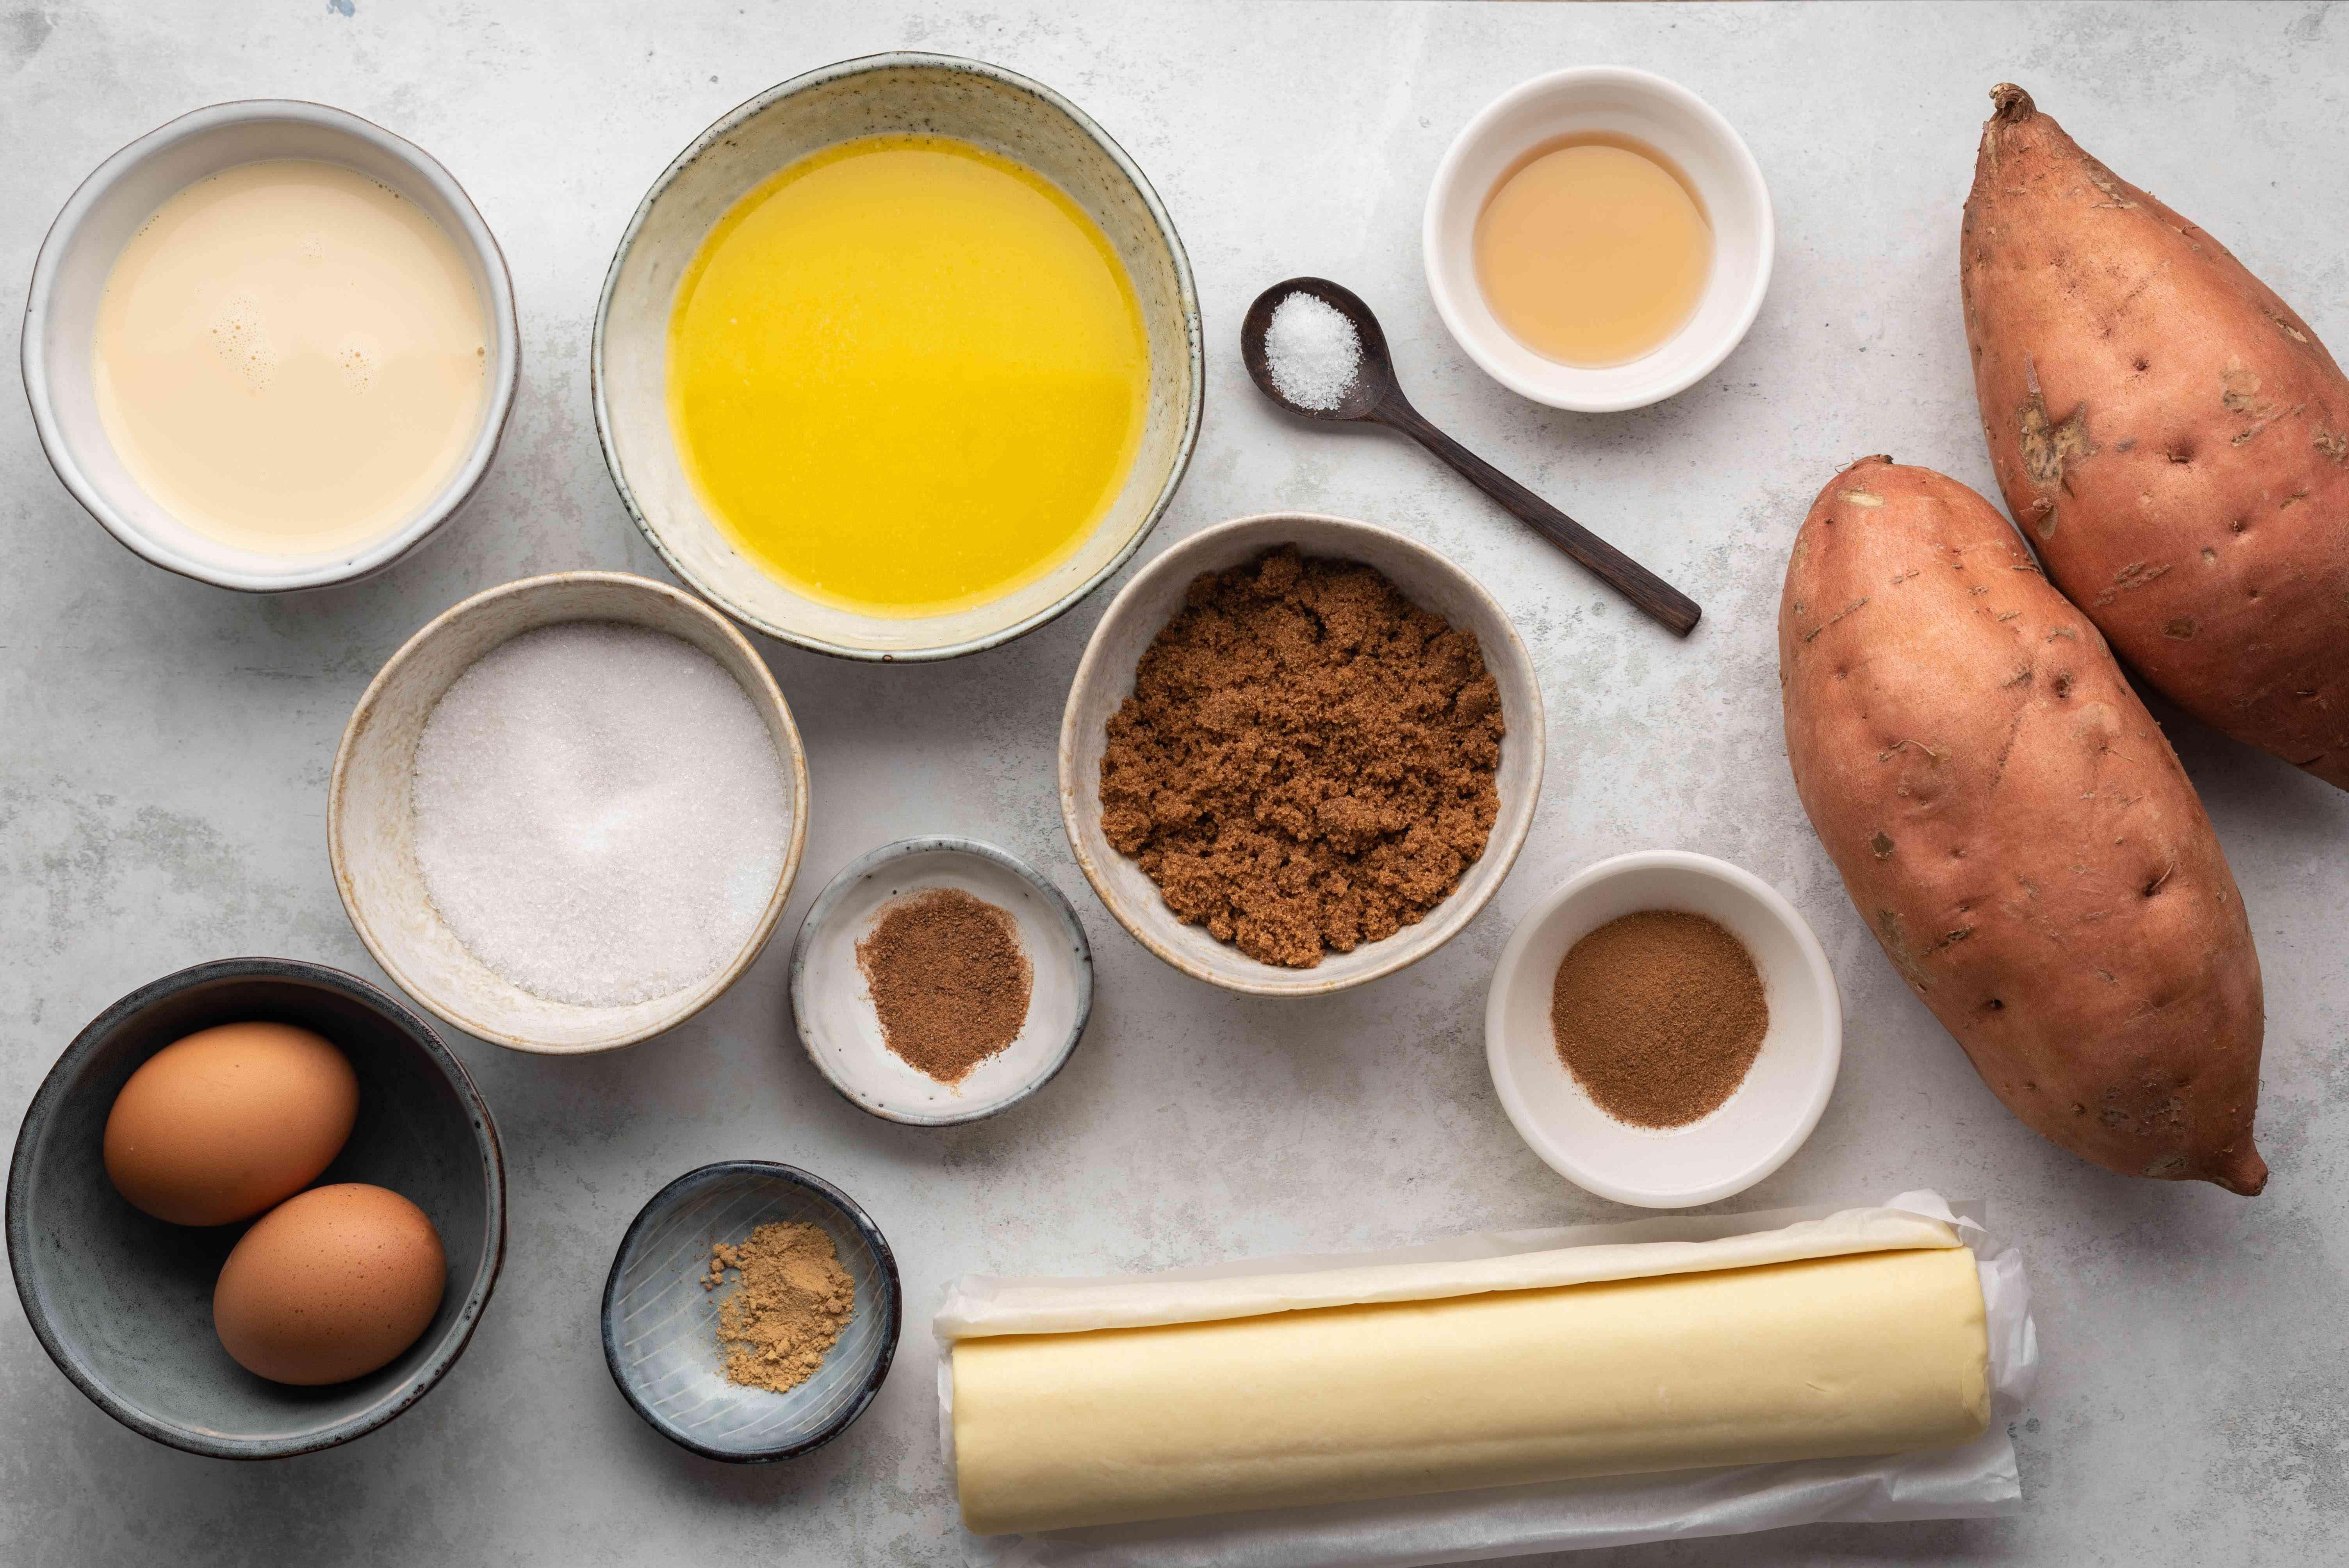 Sweet Potato Pie ingredients